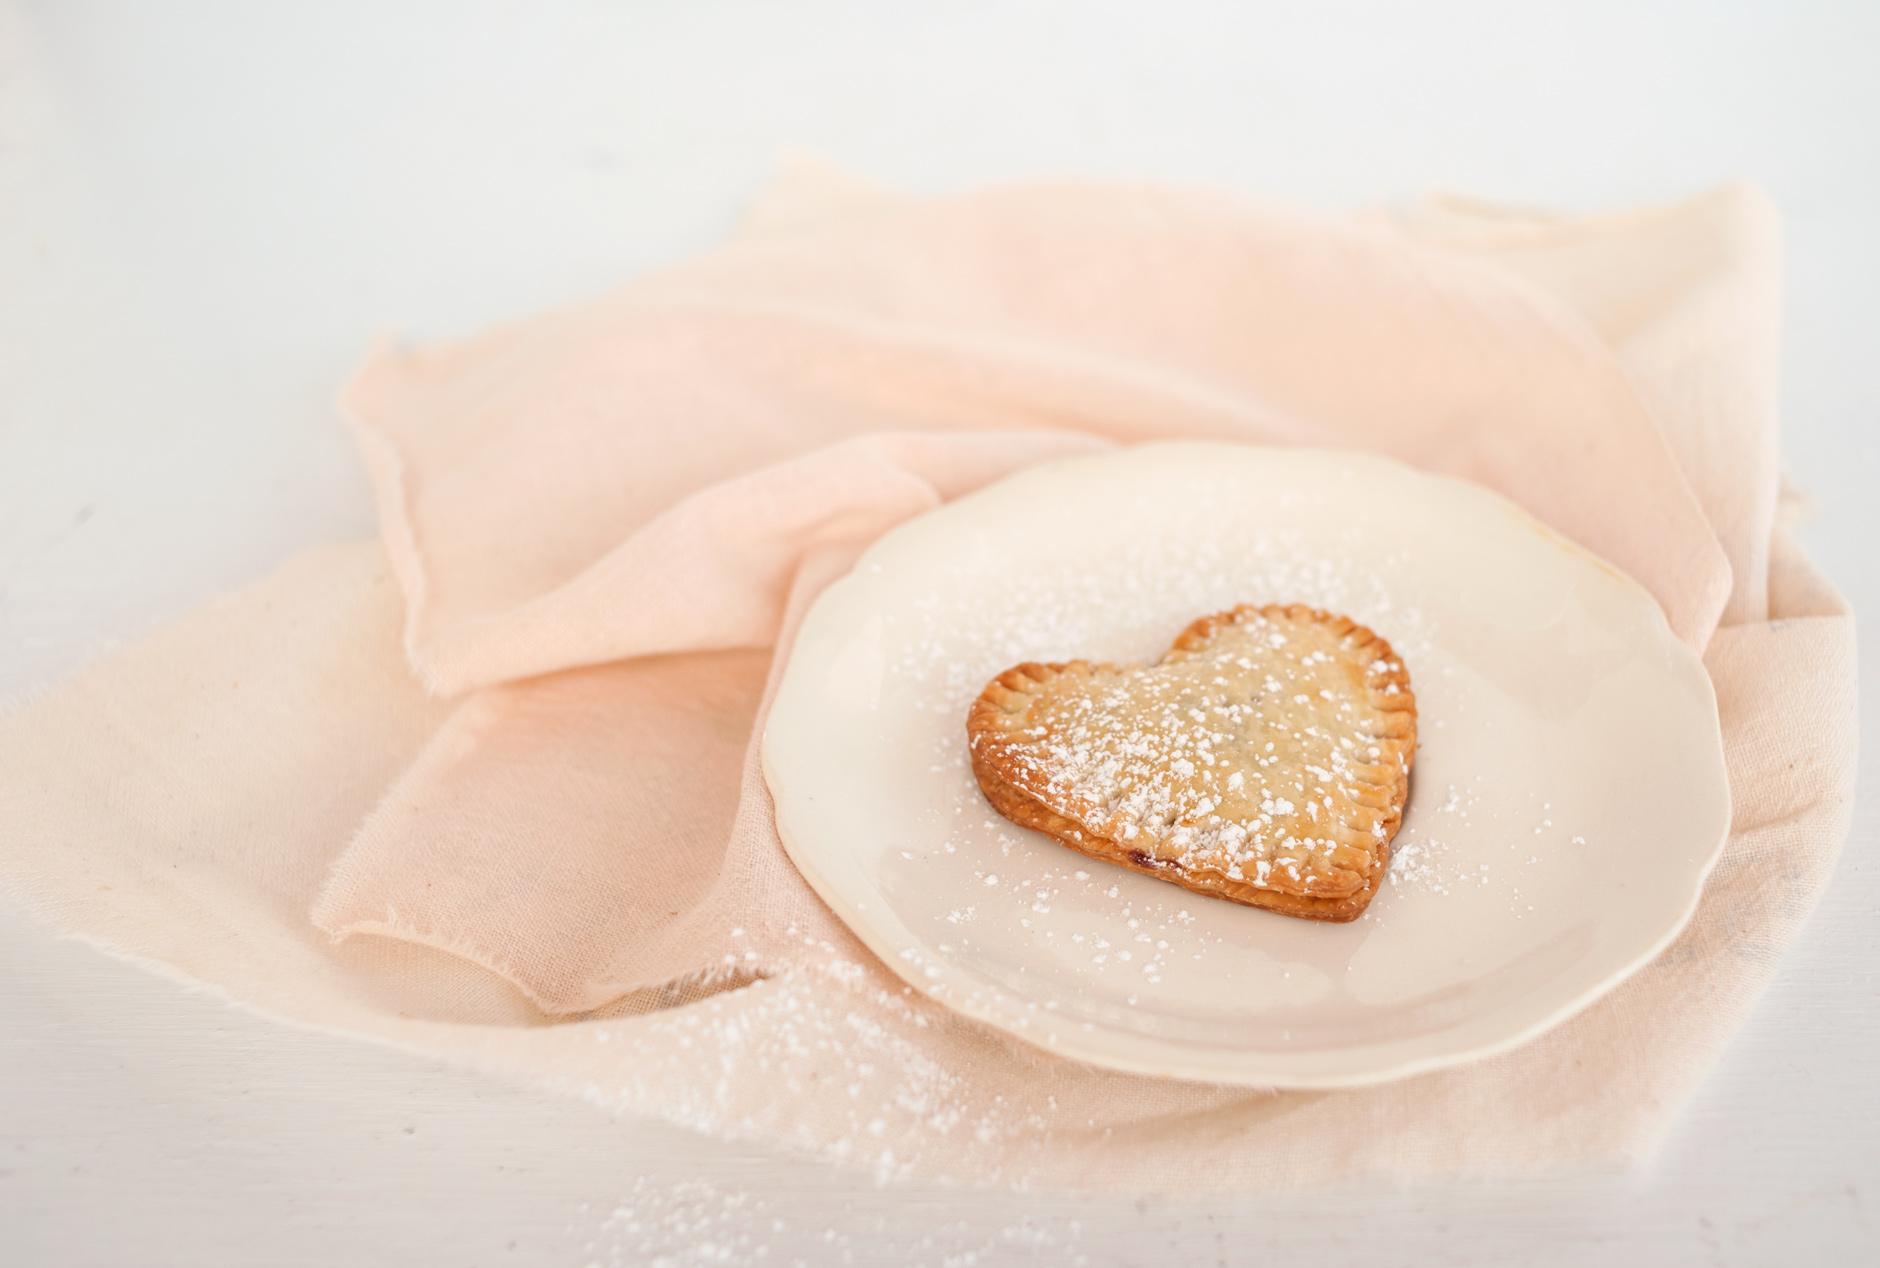 heart_pies_food_photography_3.jpg